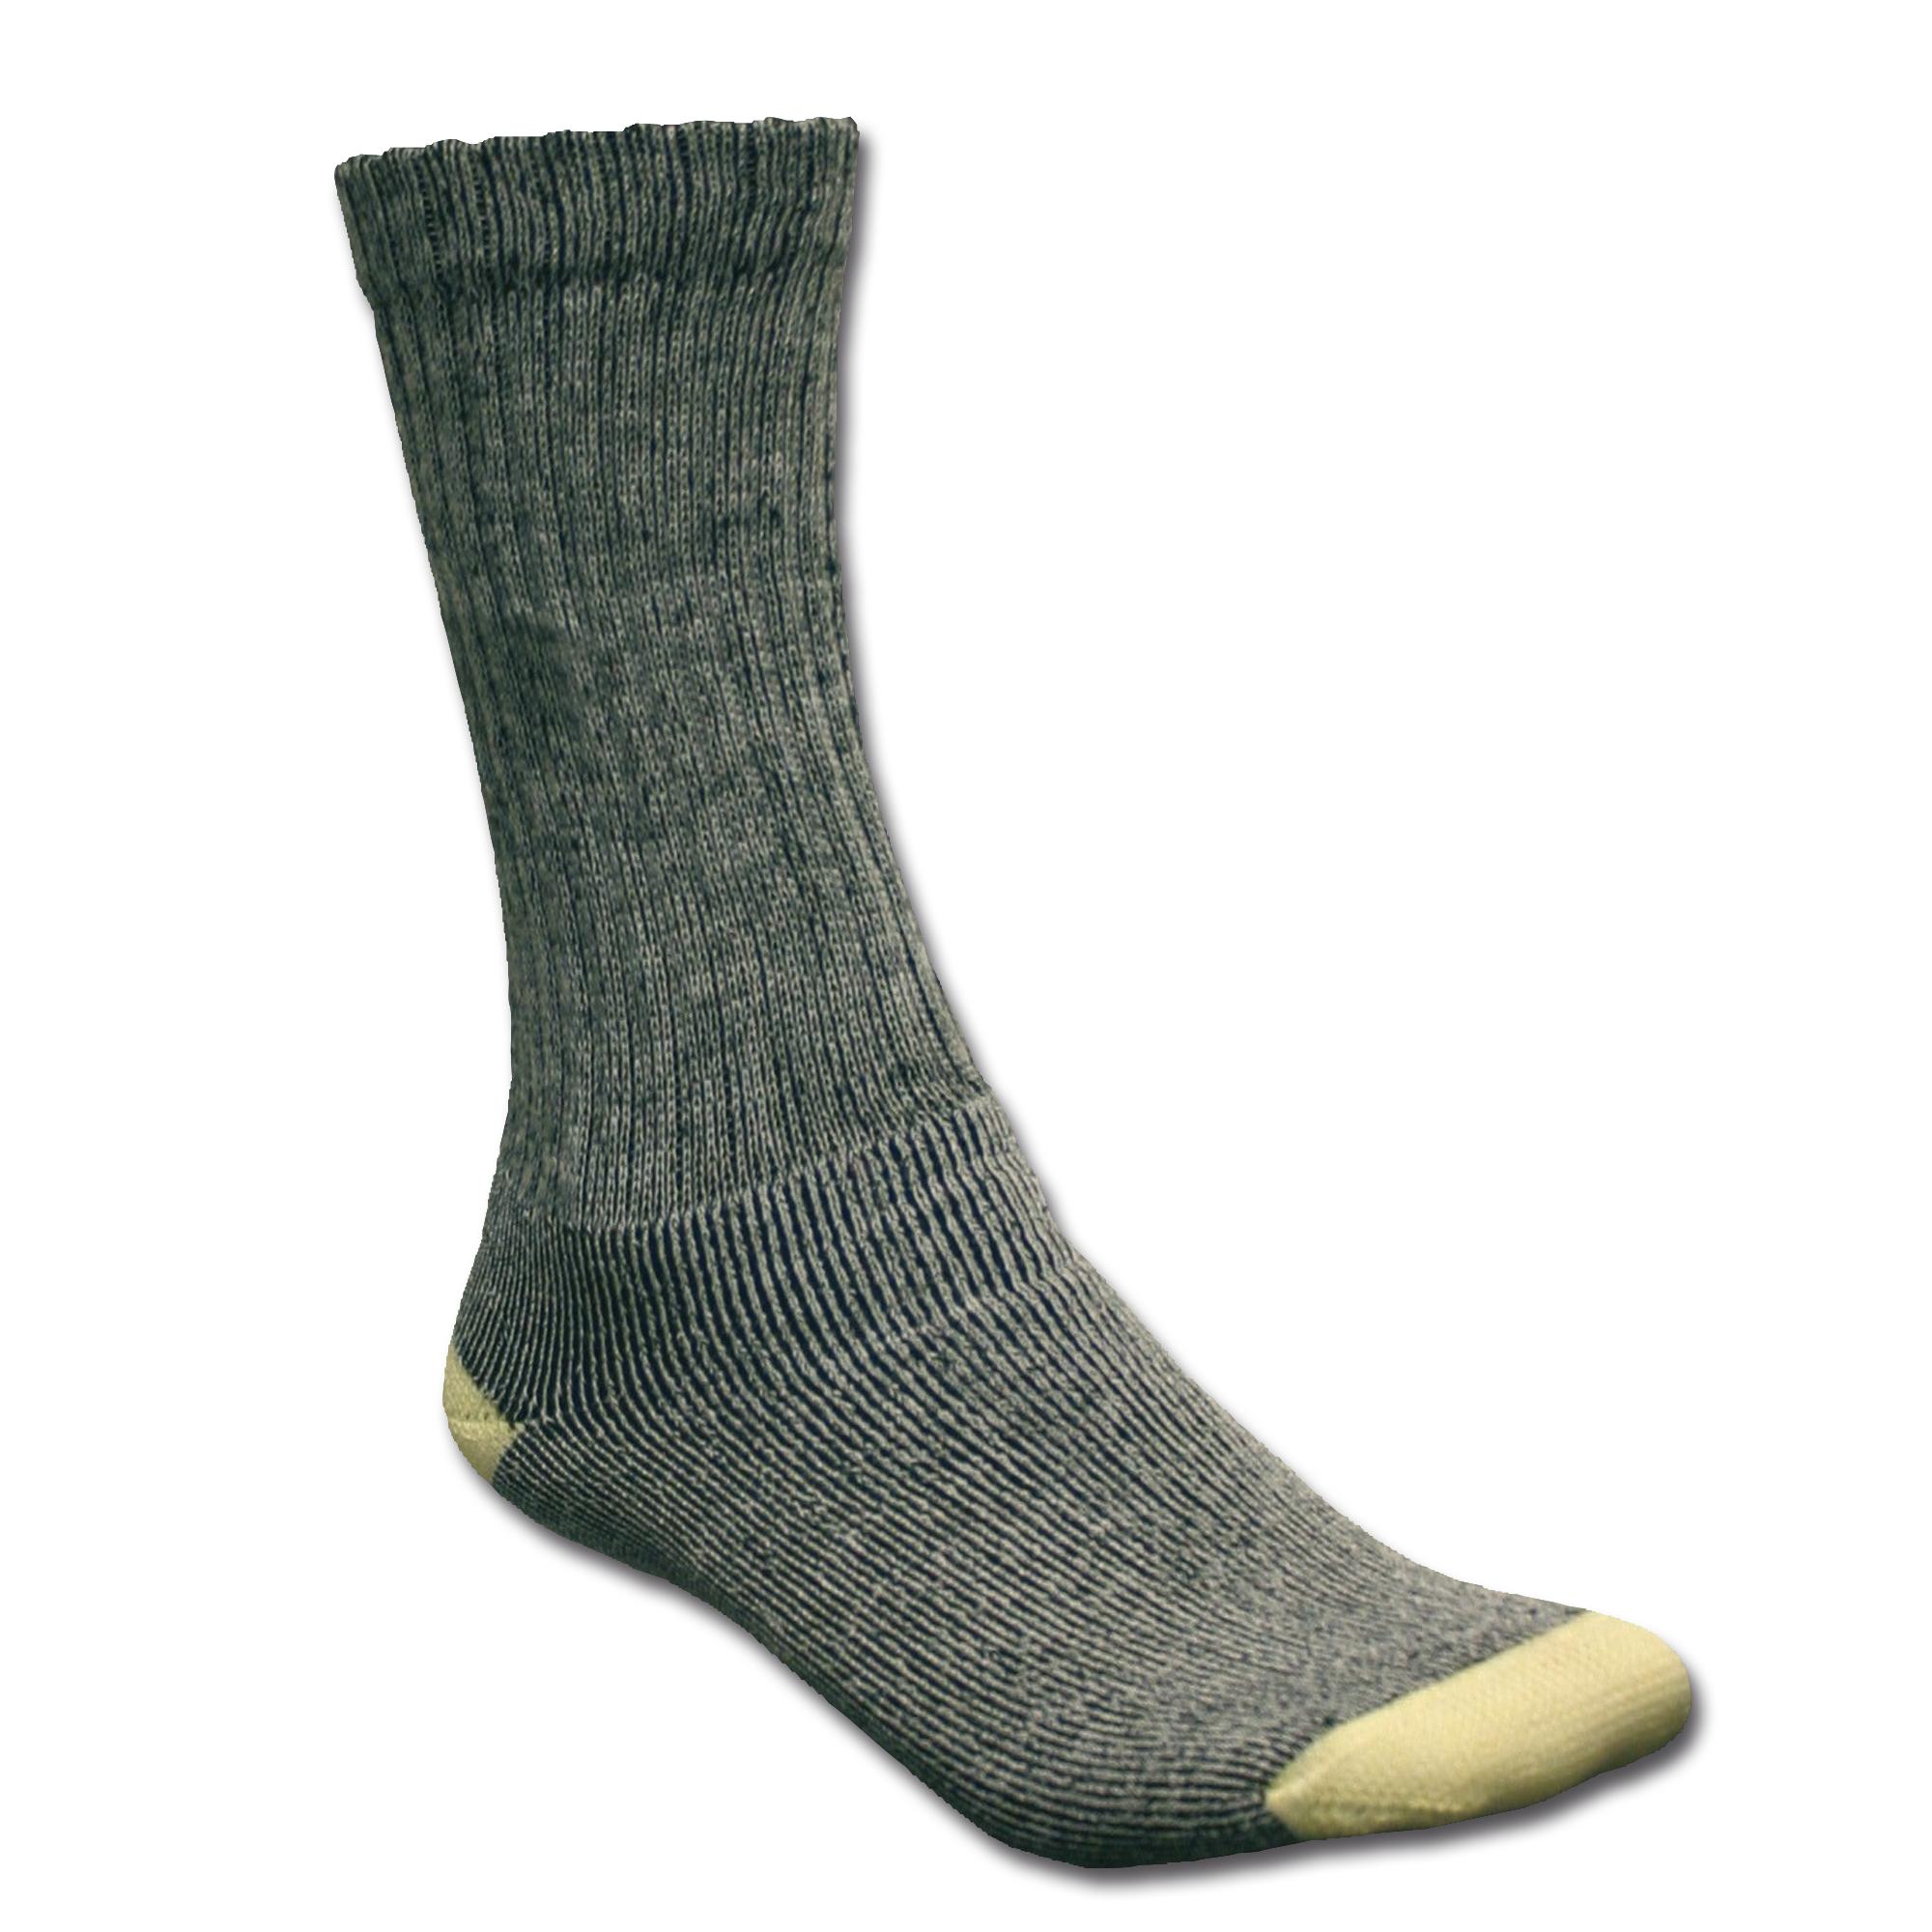 Hiking Socks Power-Thermo